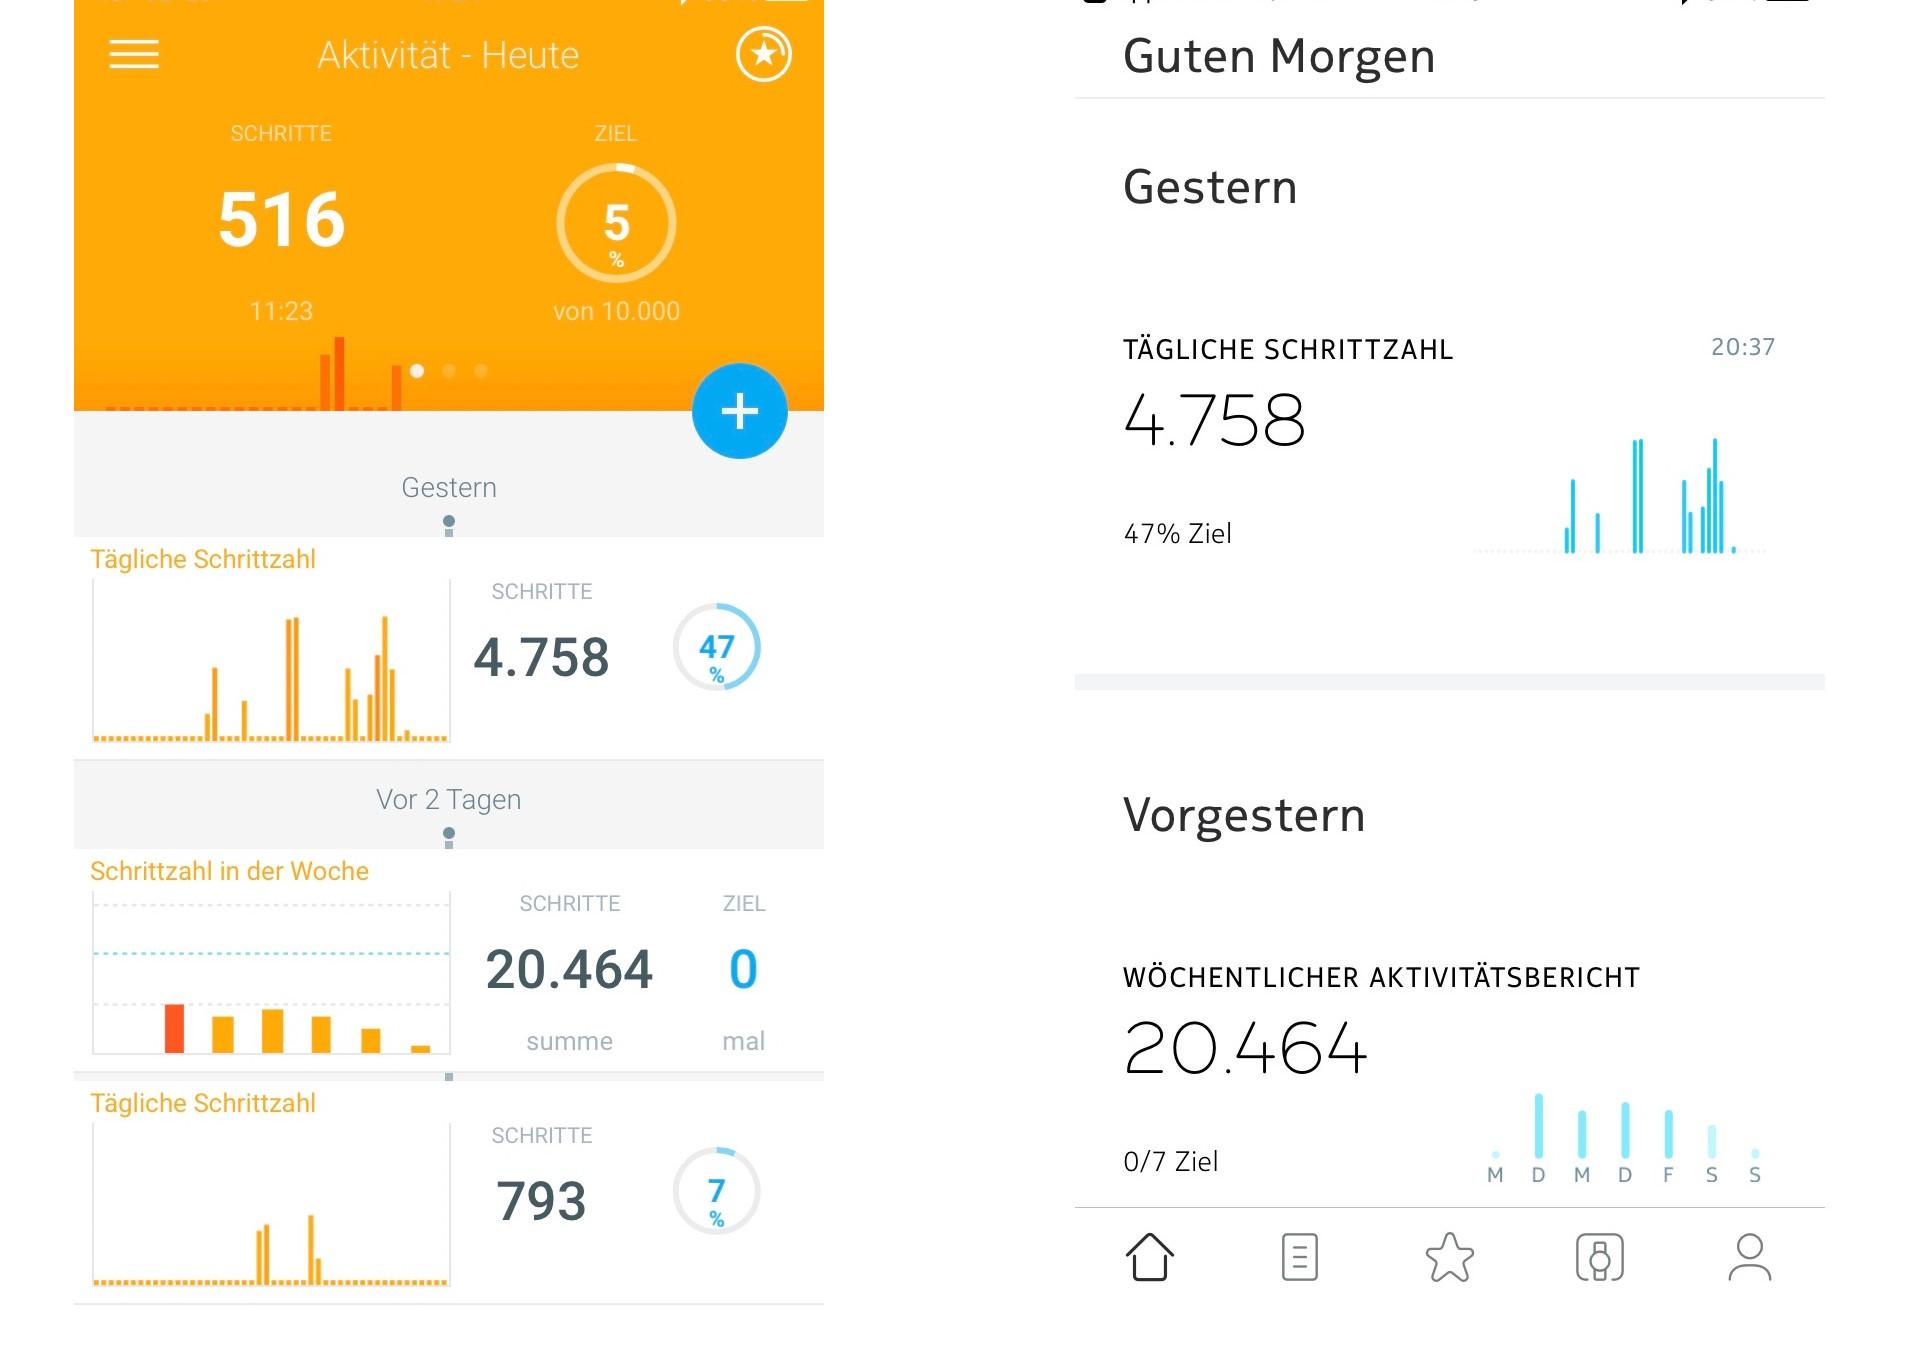 Nokia Health Mate App Die alte App links neben der neuen Healt Mate App Quelle Screenshot